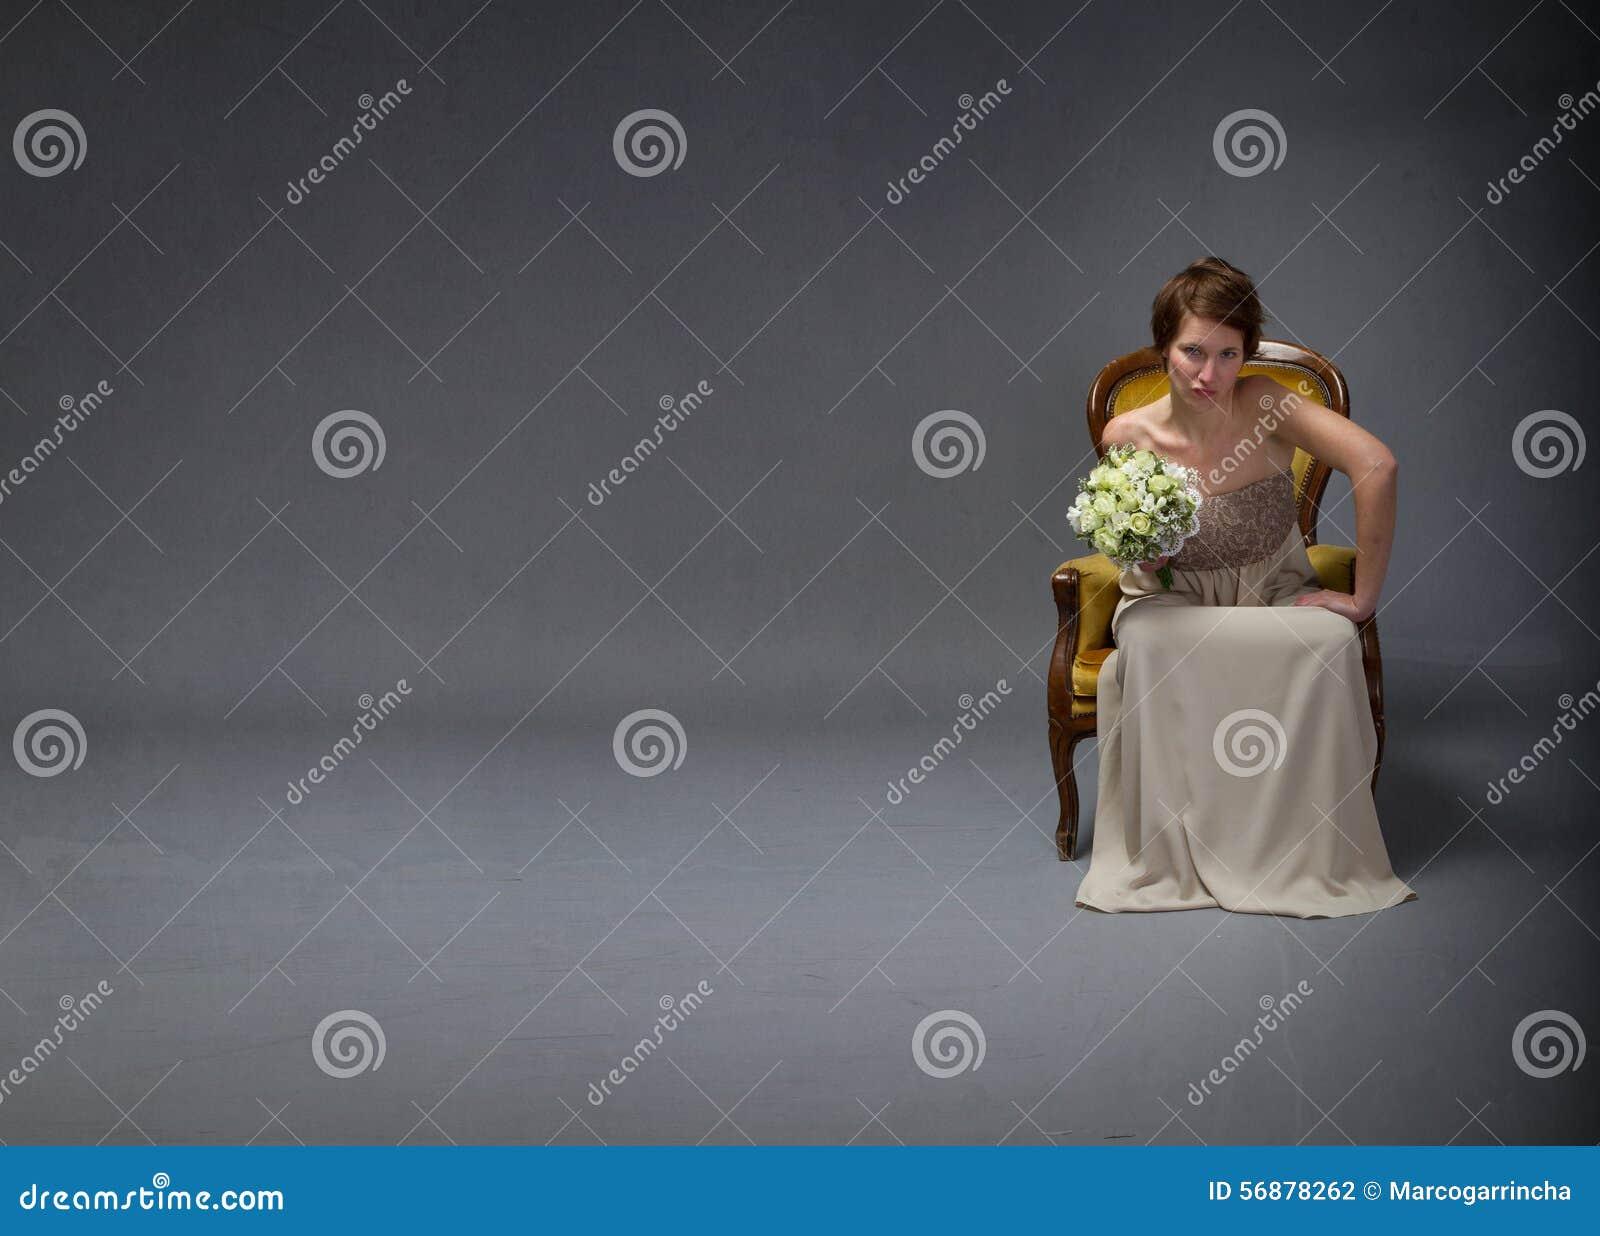 Bride woman unhappy in solitude mode